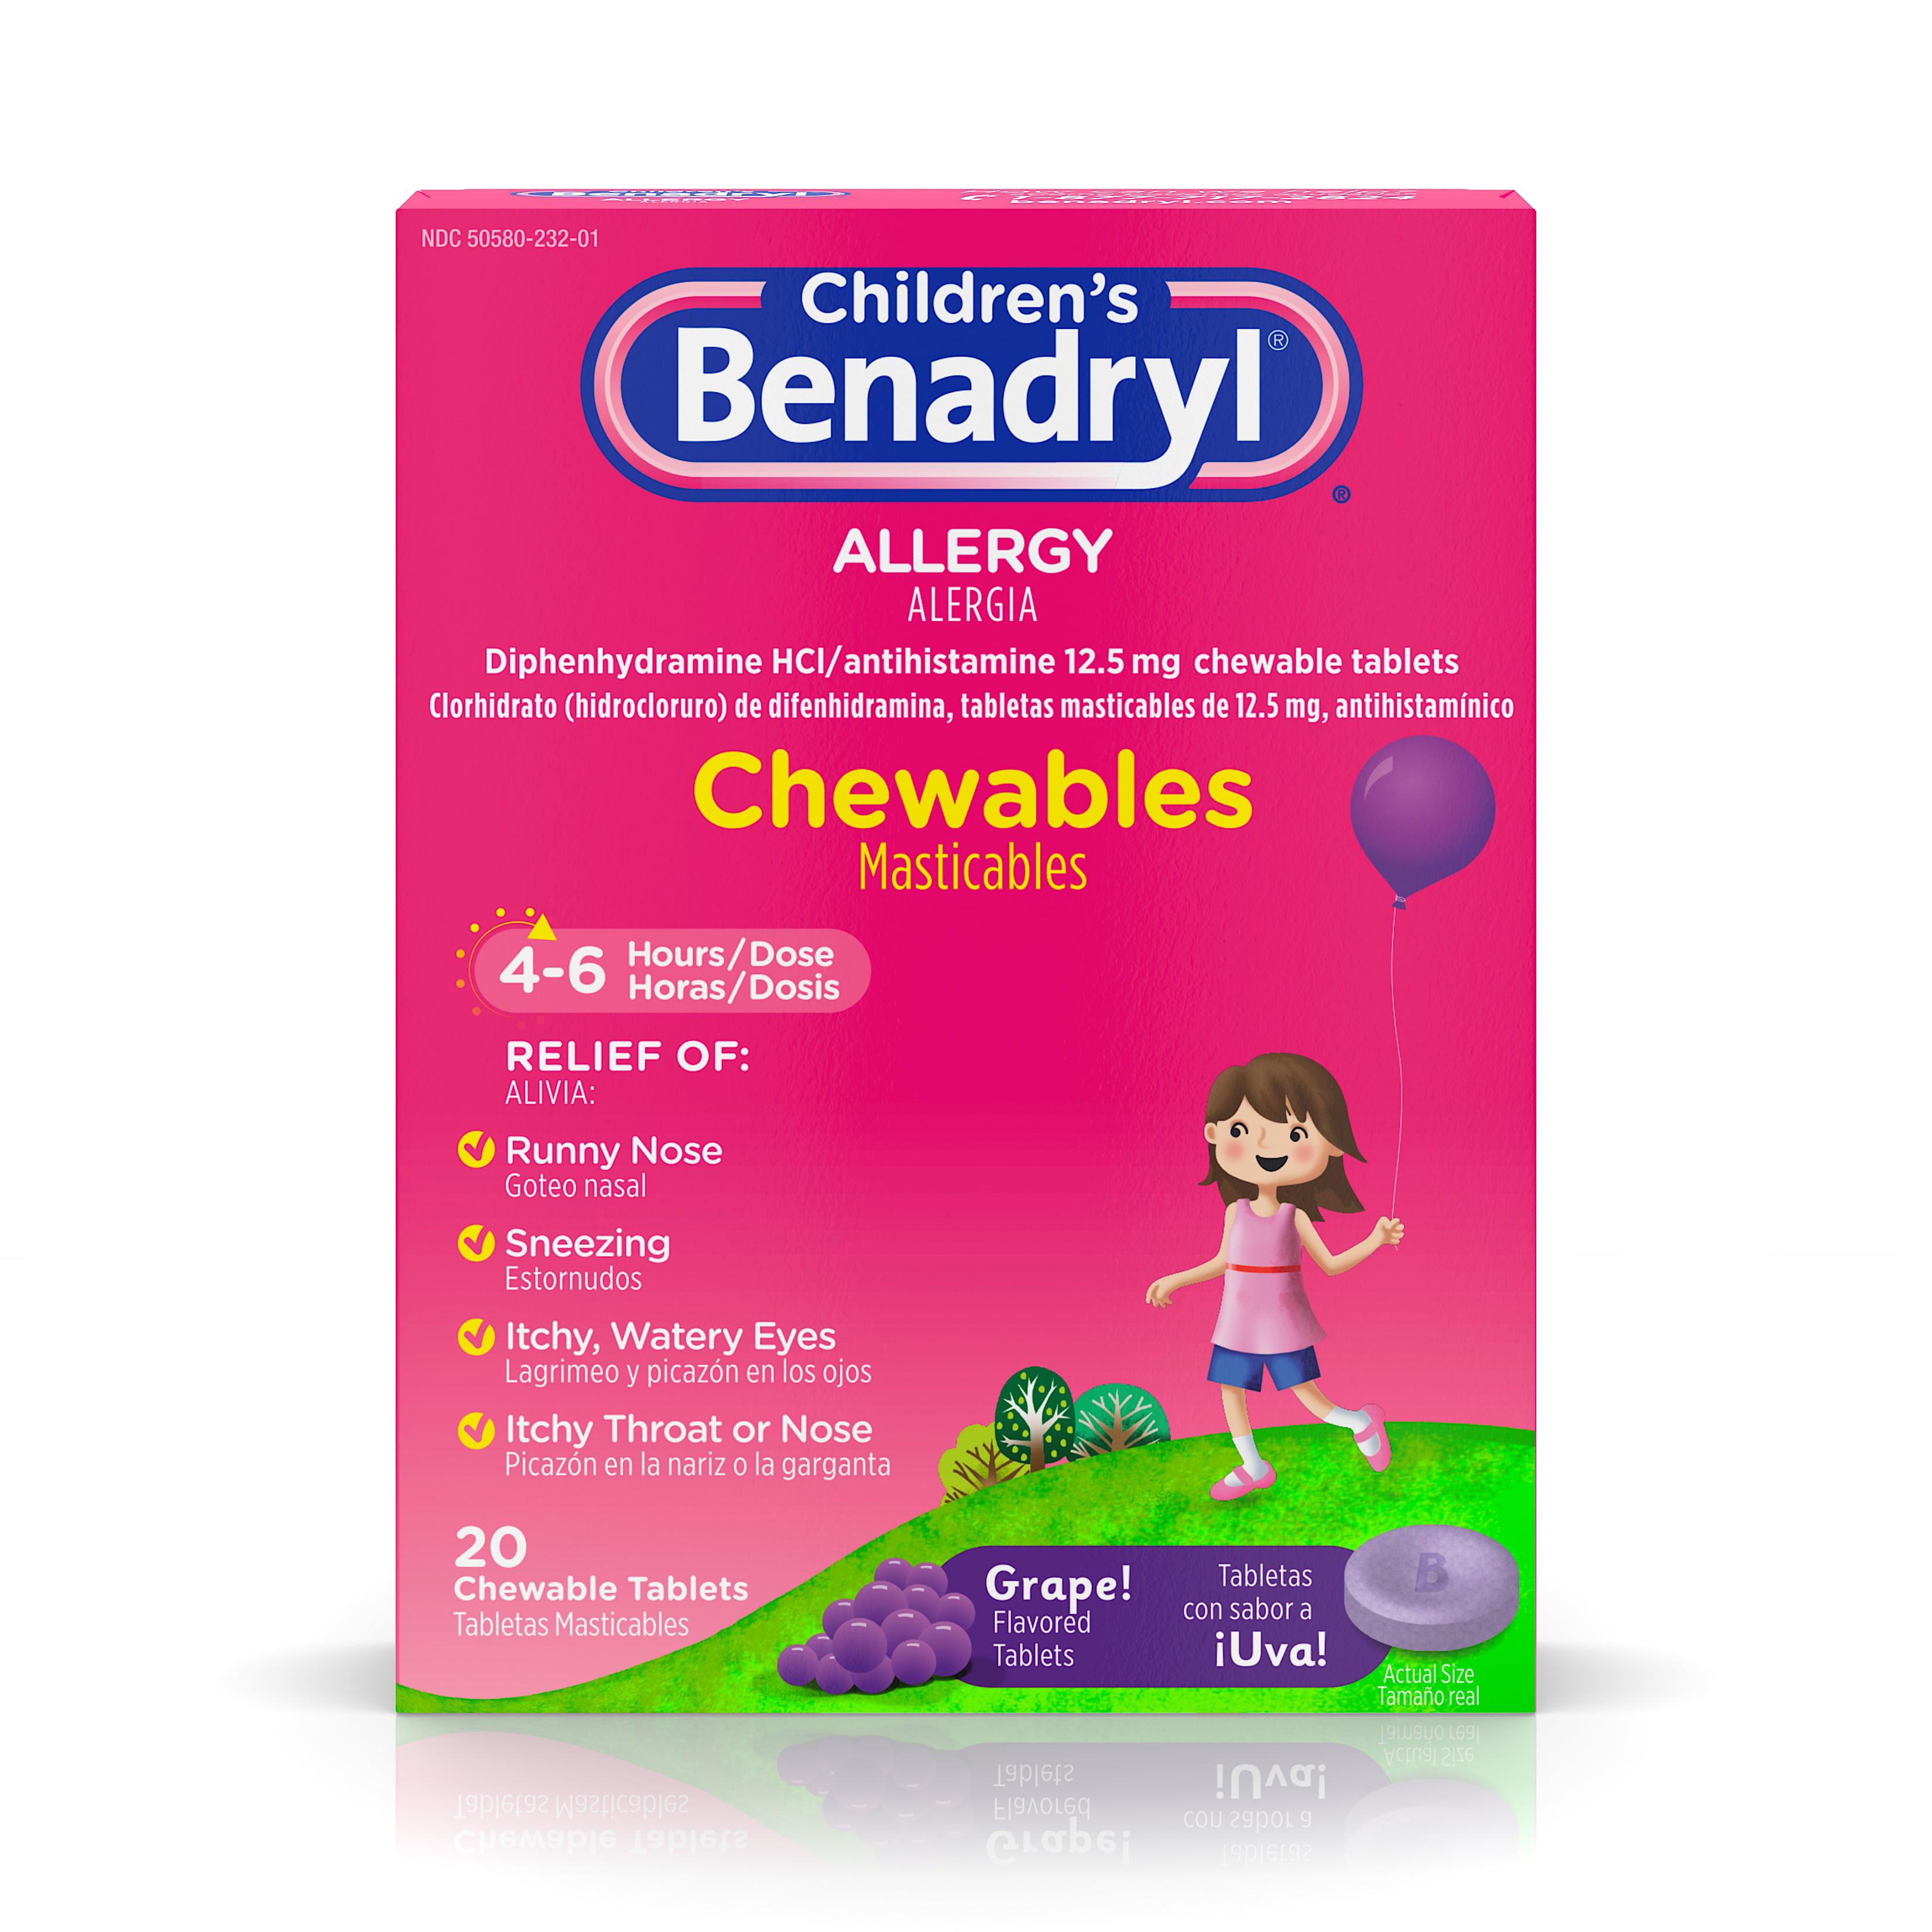 Chewing benadryl